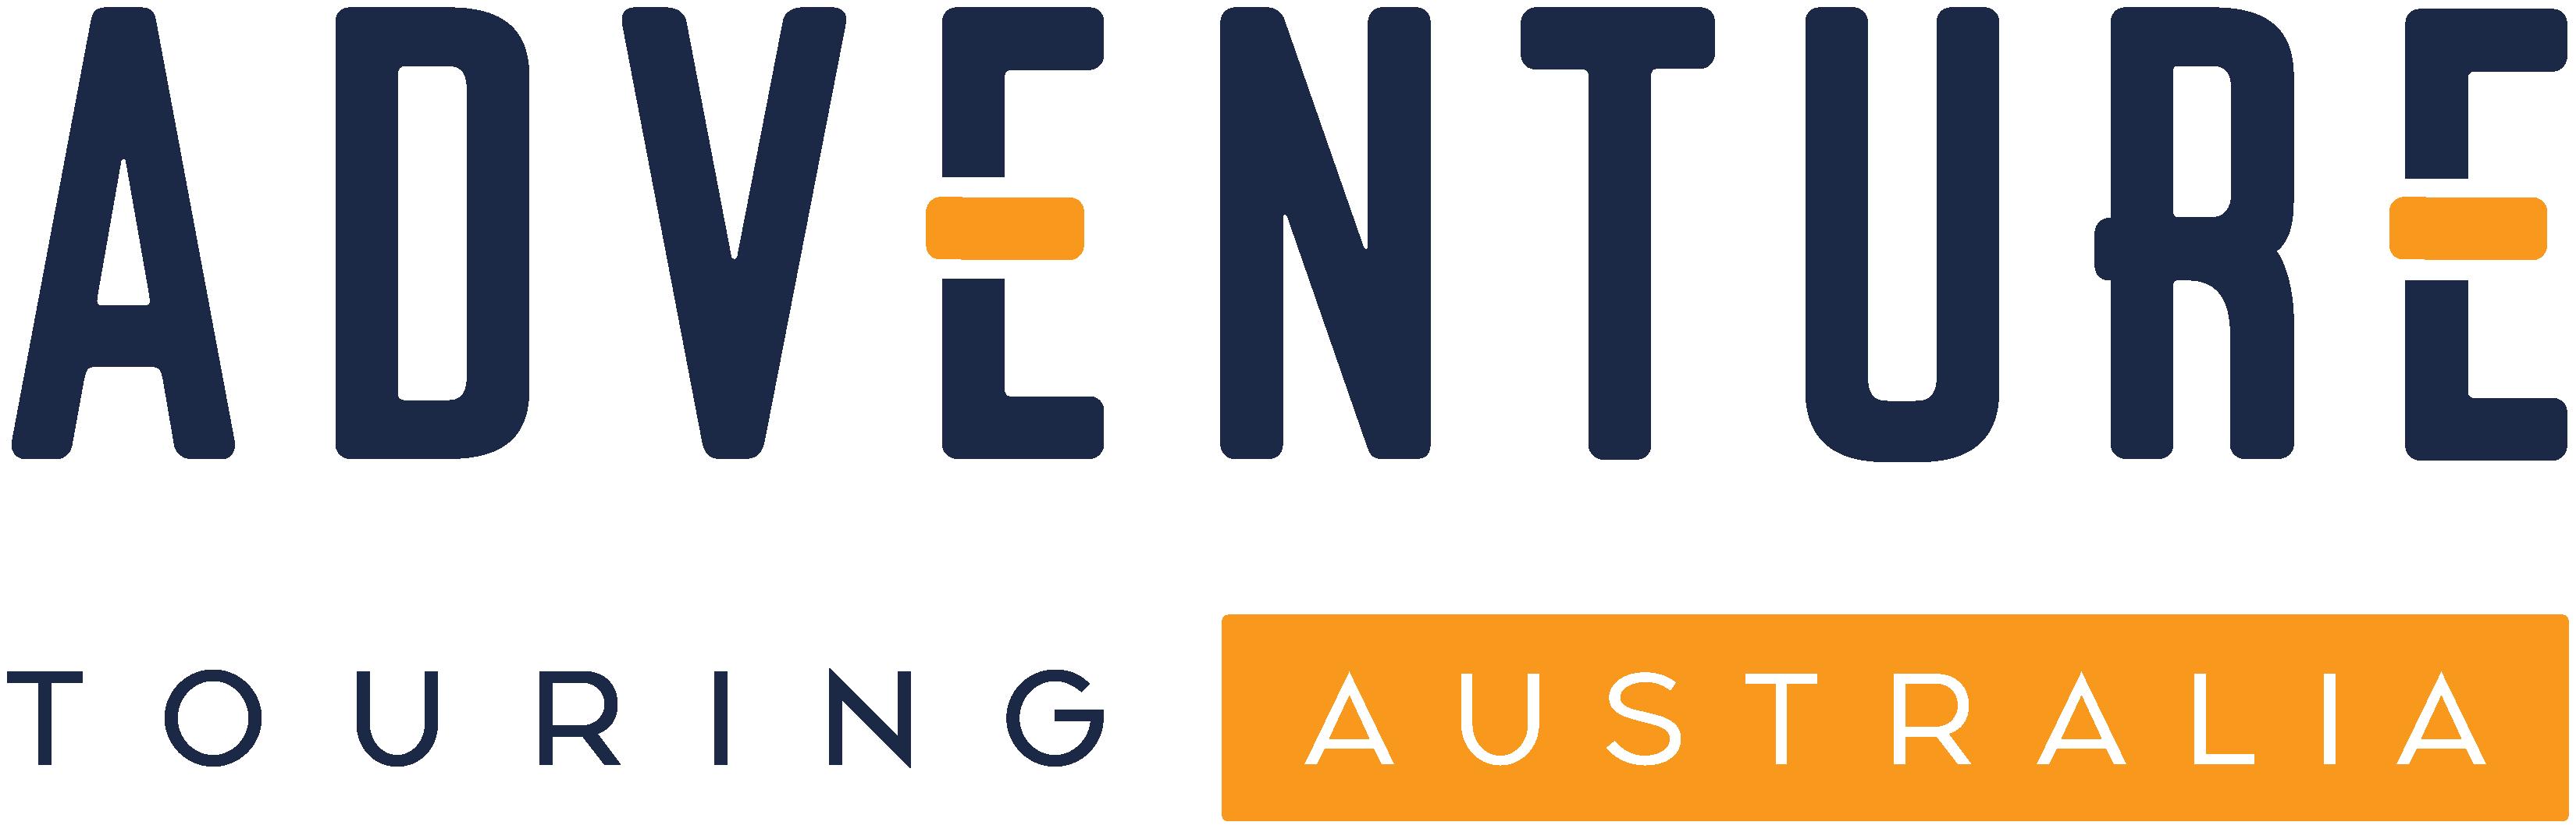 Adventure Touring Australia